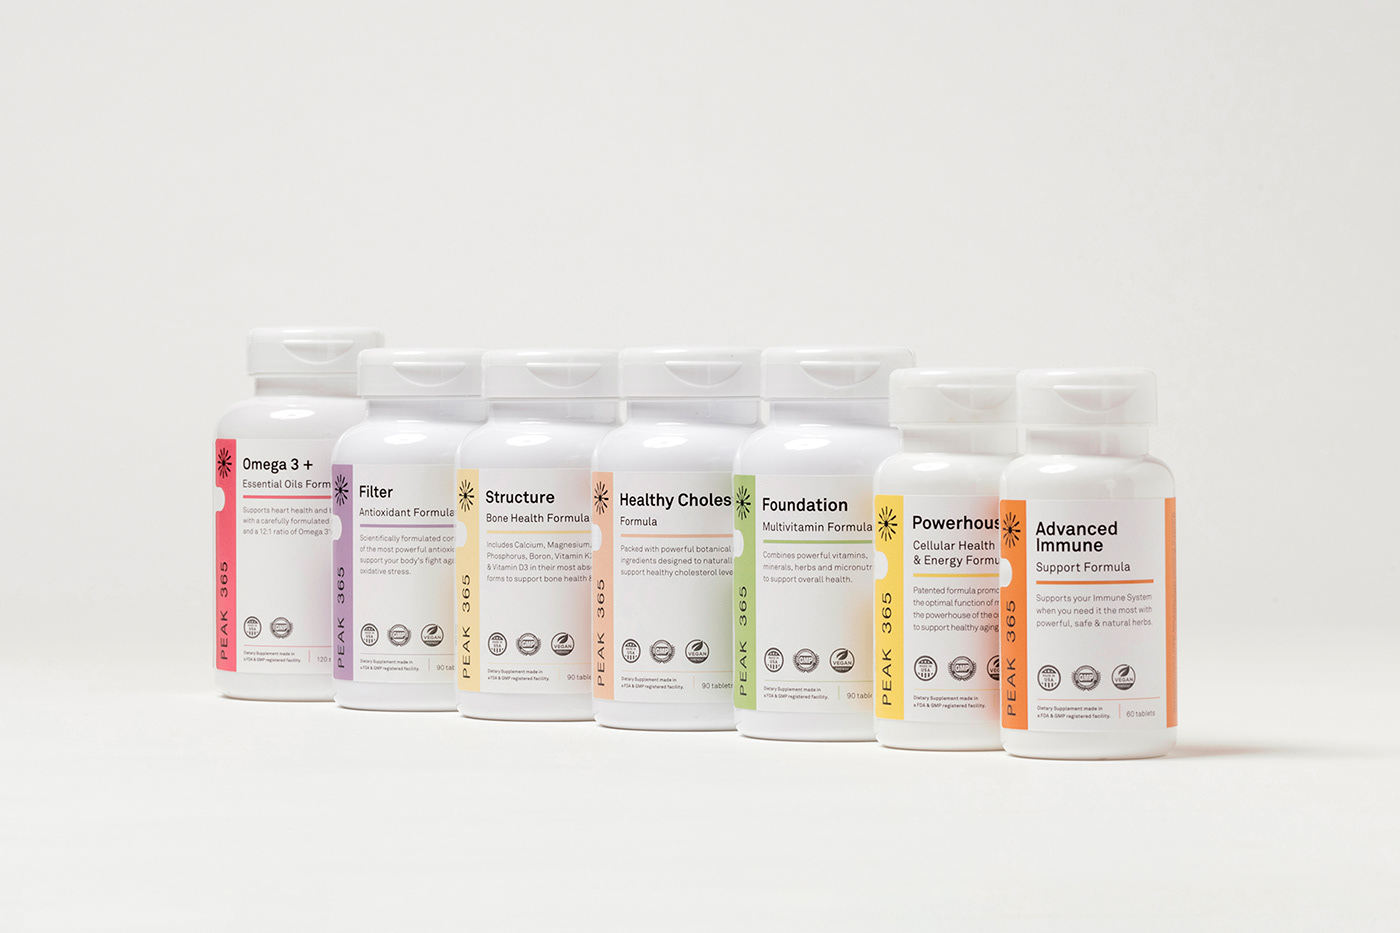 branding  Color Code Health minimalist nutrition Packaging pills science scientific supplements